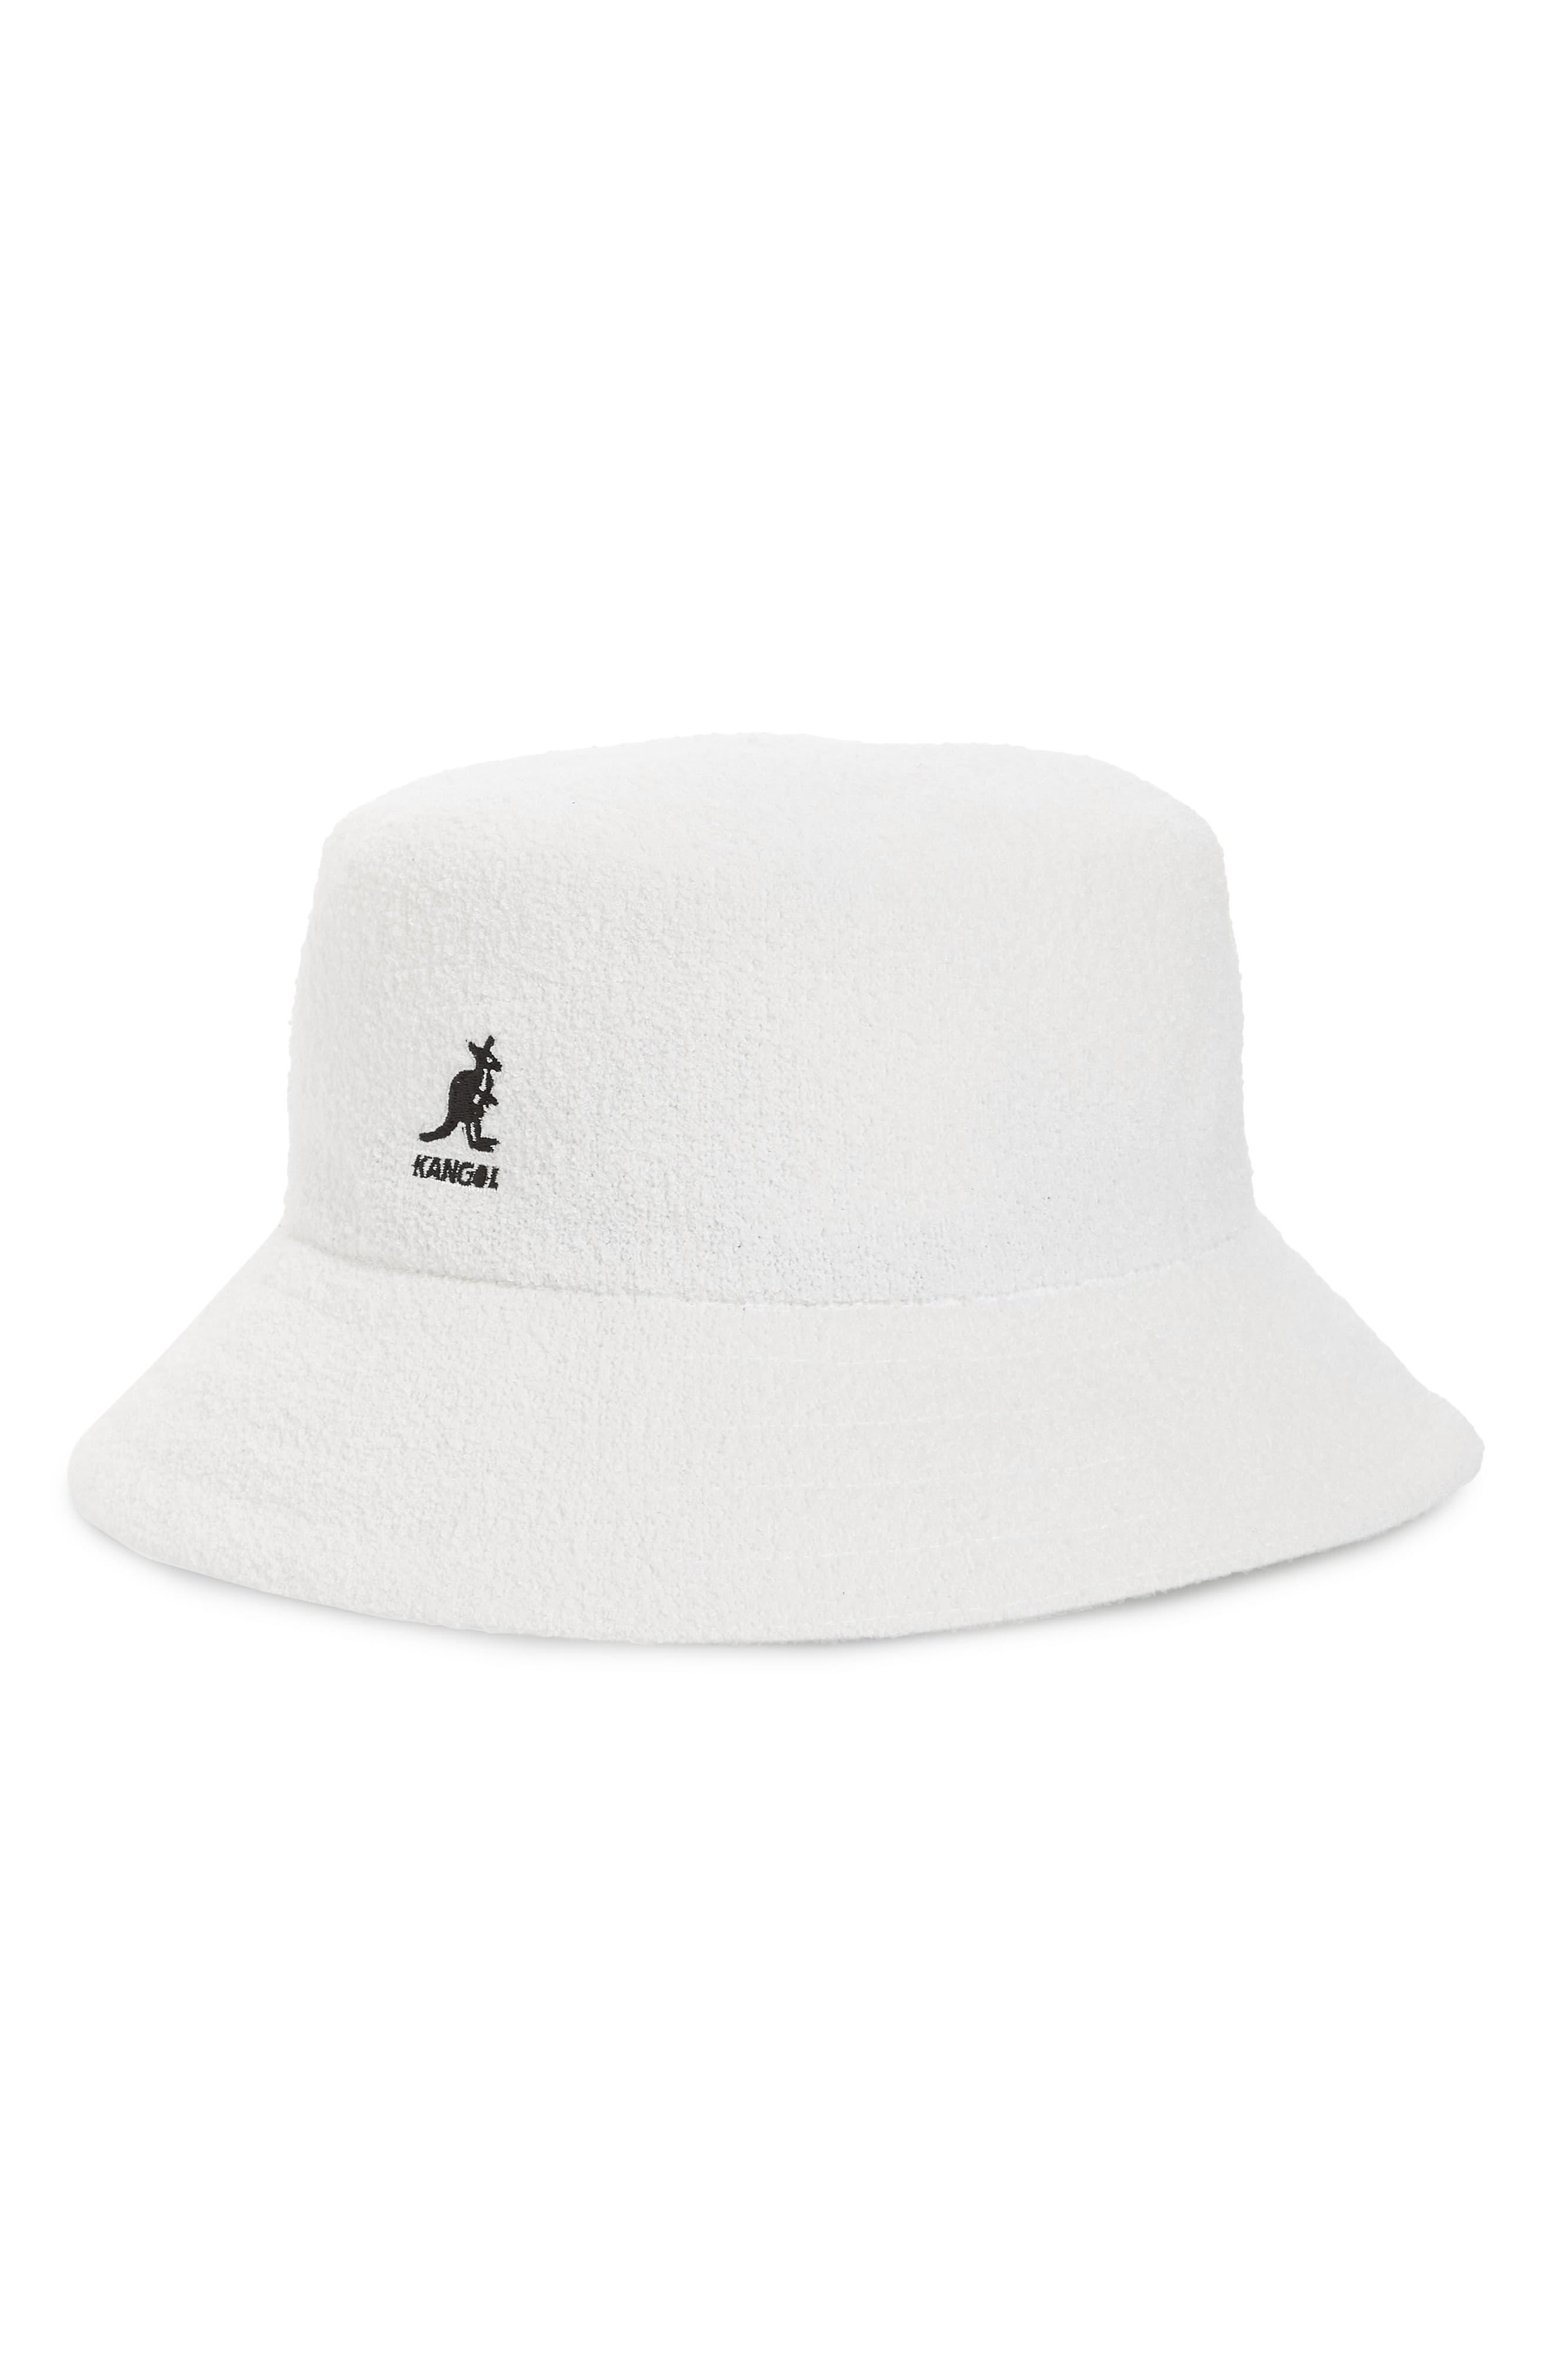 Kangol Mens Bermuda Unisex Terry Boucle Logo Bucket Hat BHFO 5108